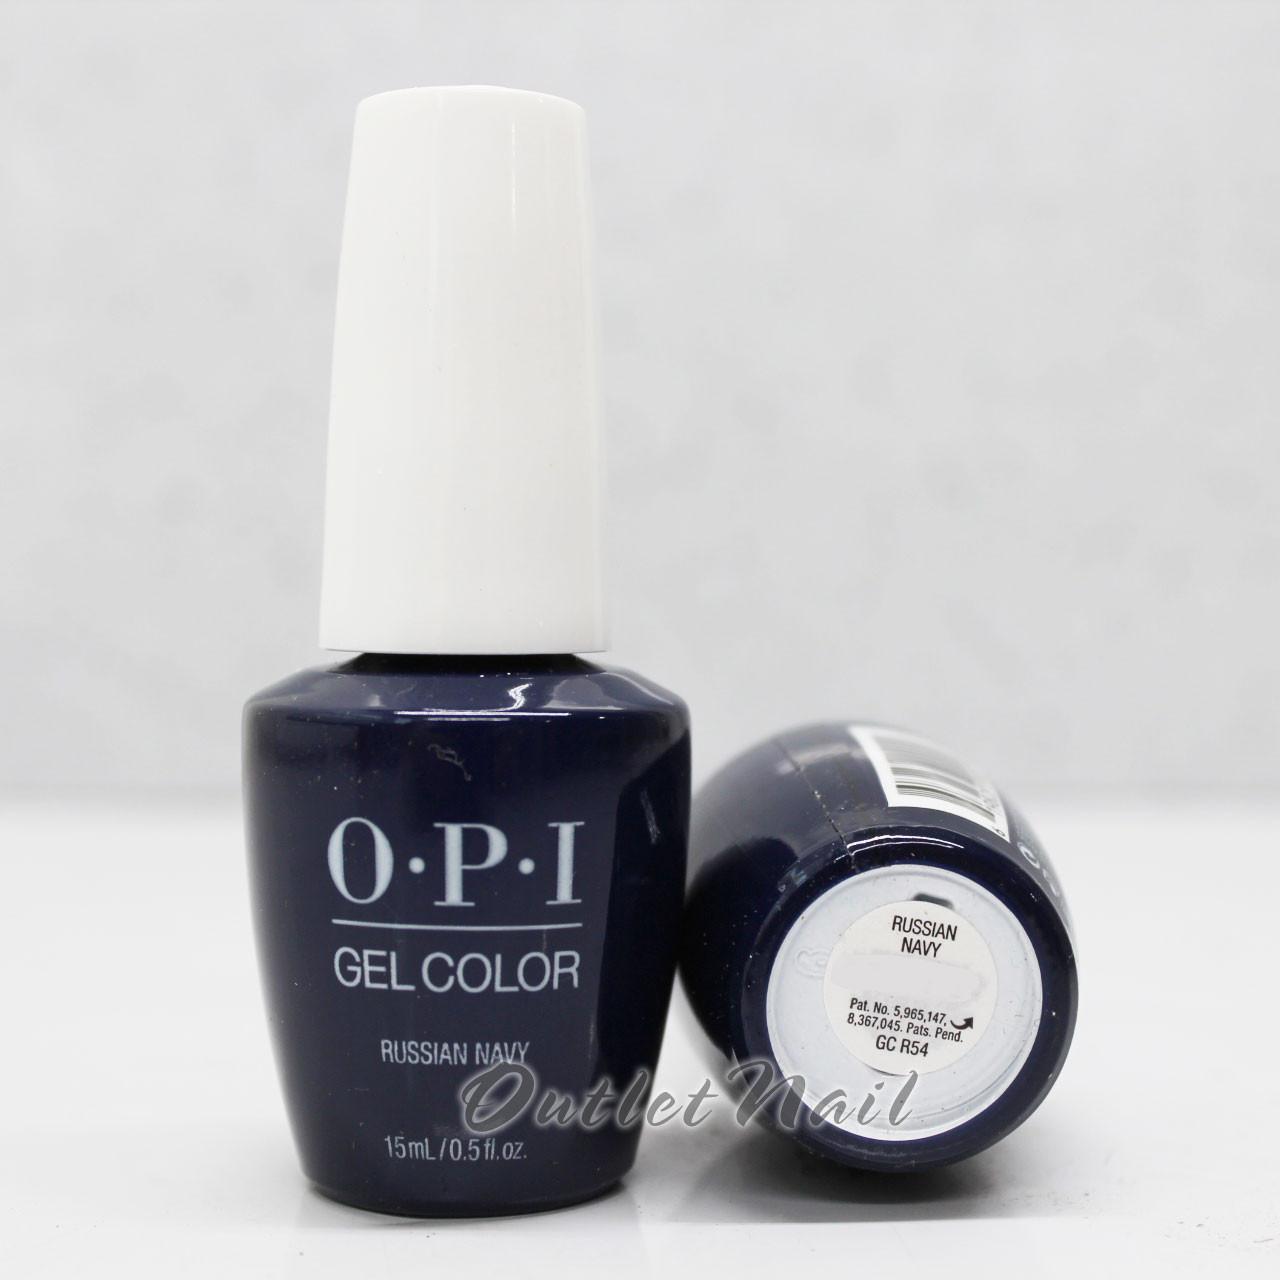 OPI GelColor RUSSIAN NAVY GC R54 15ml 0.5oz Soak Off UV LED Gel Nail ...